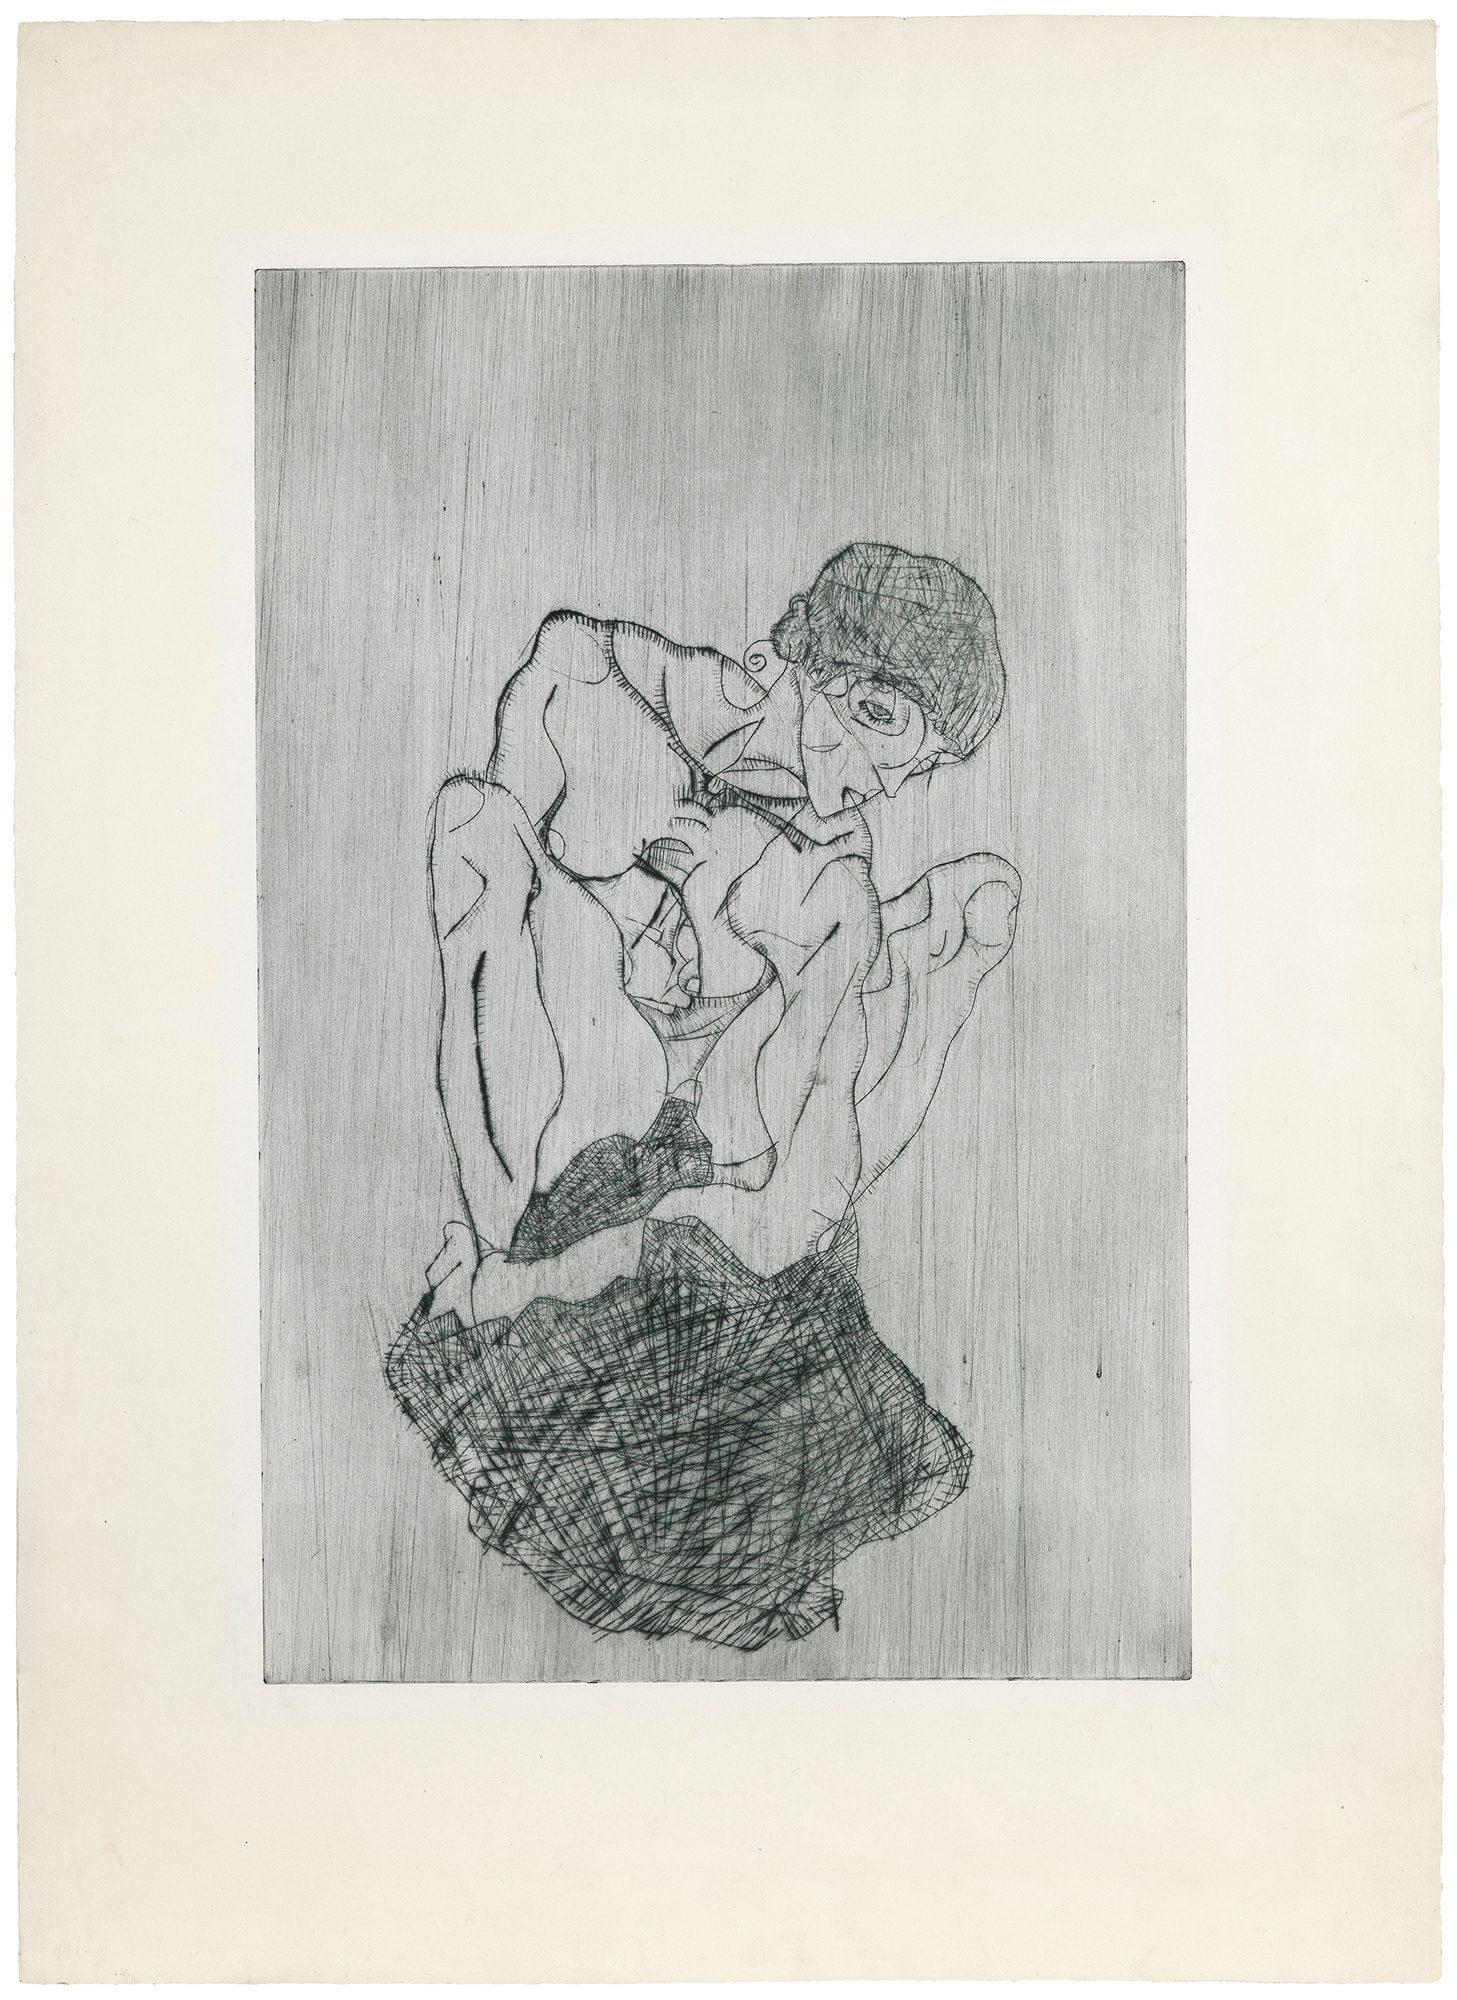 Egon Schiele (Austrian, 1890–1918) Kümmernis (Sorrow), 1914. Etching, 20 x 13 in. Gift of Madeleine P. and Harvey R. Plonsker, Class of 1961, M.2015.25.2